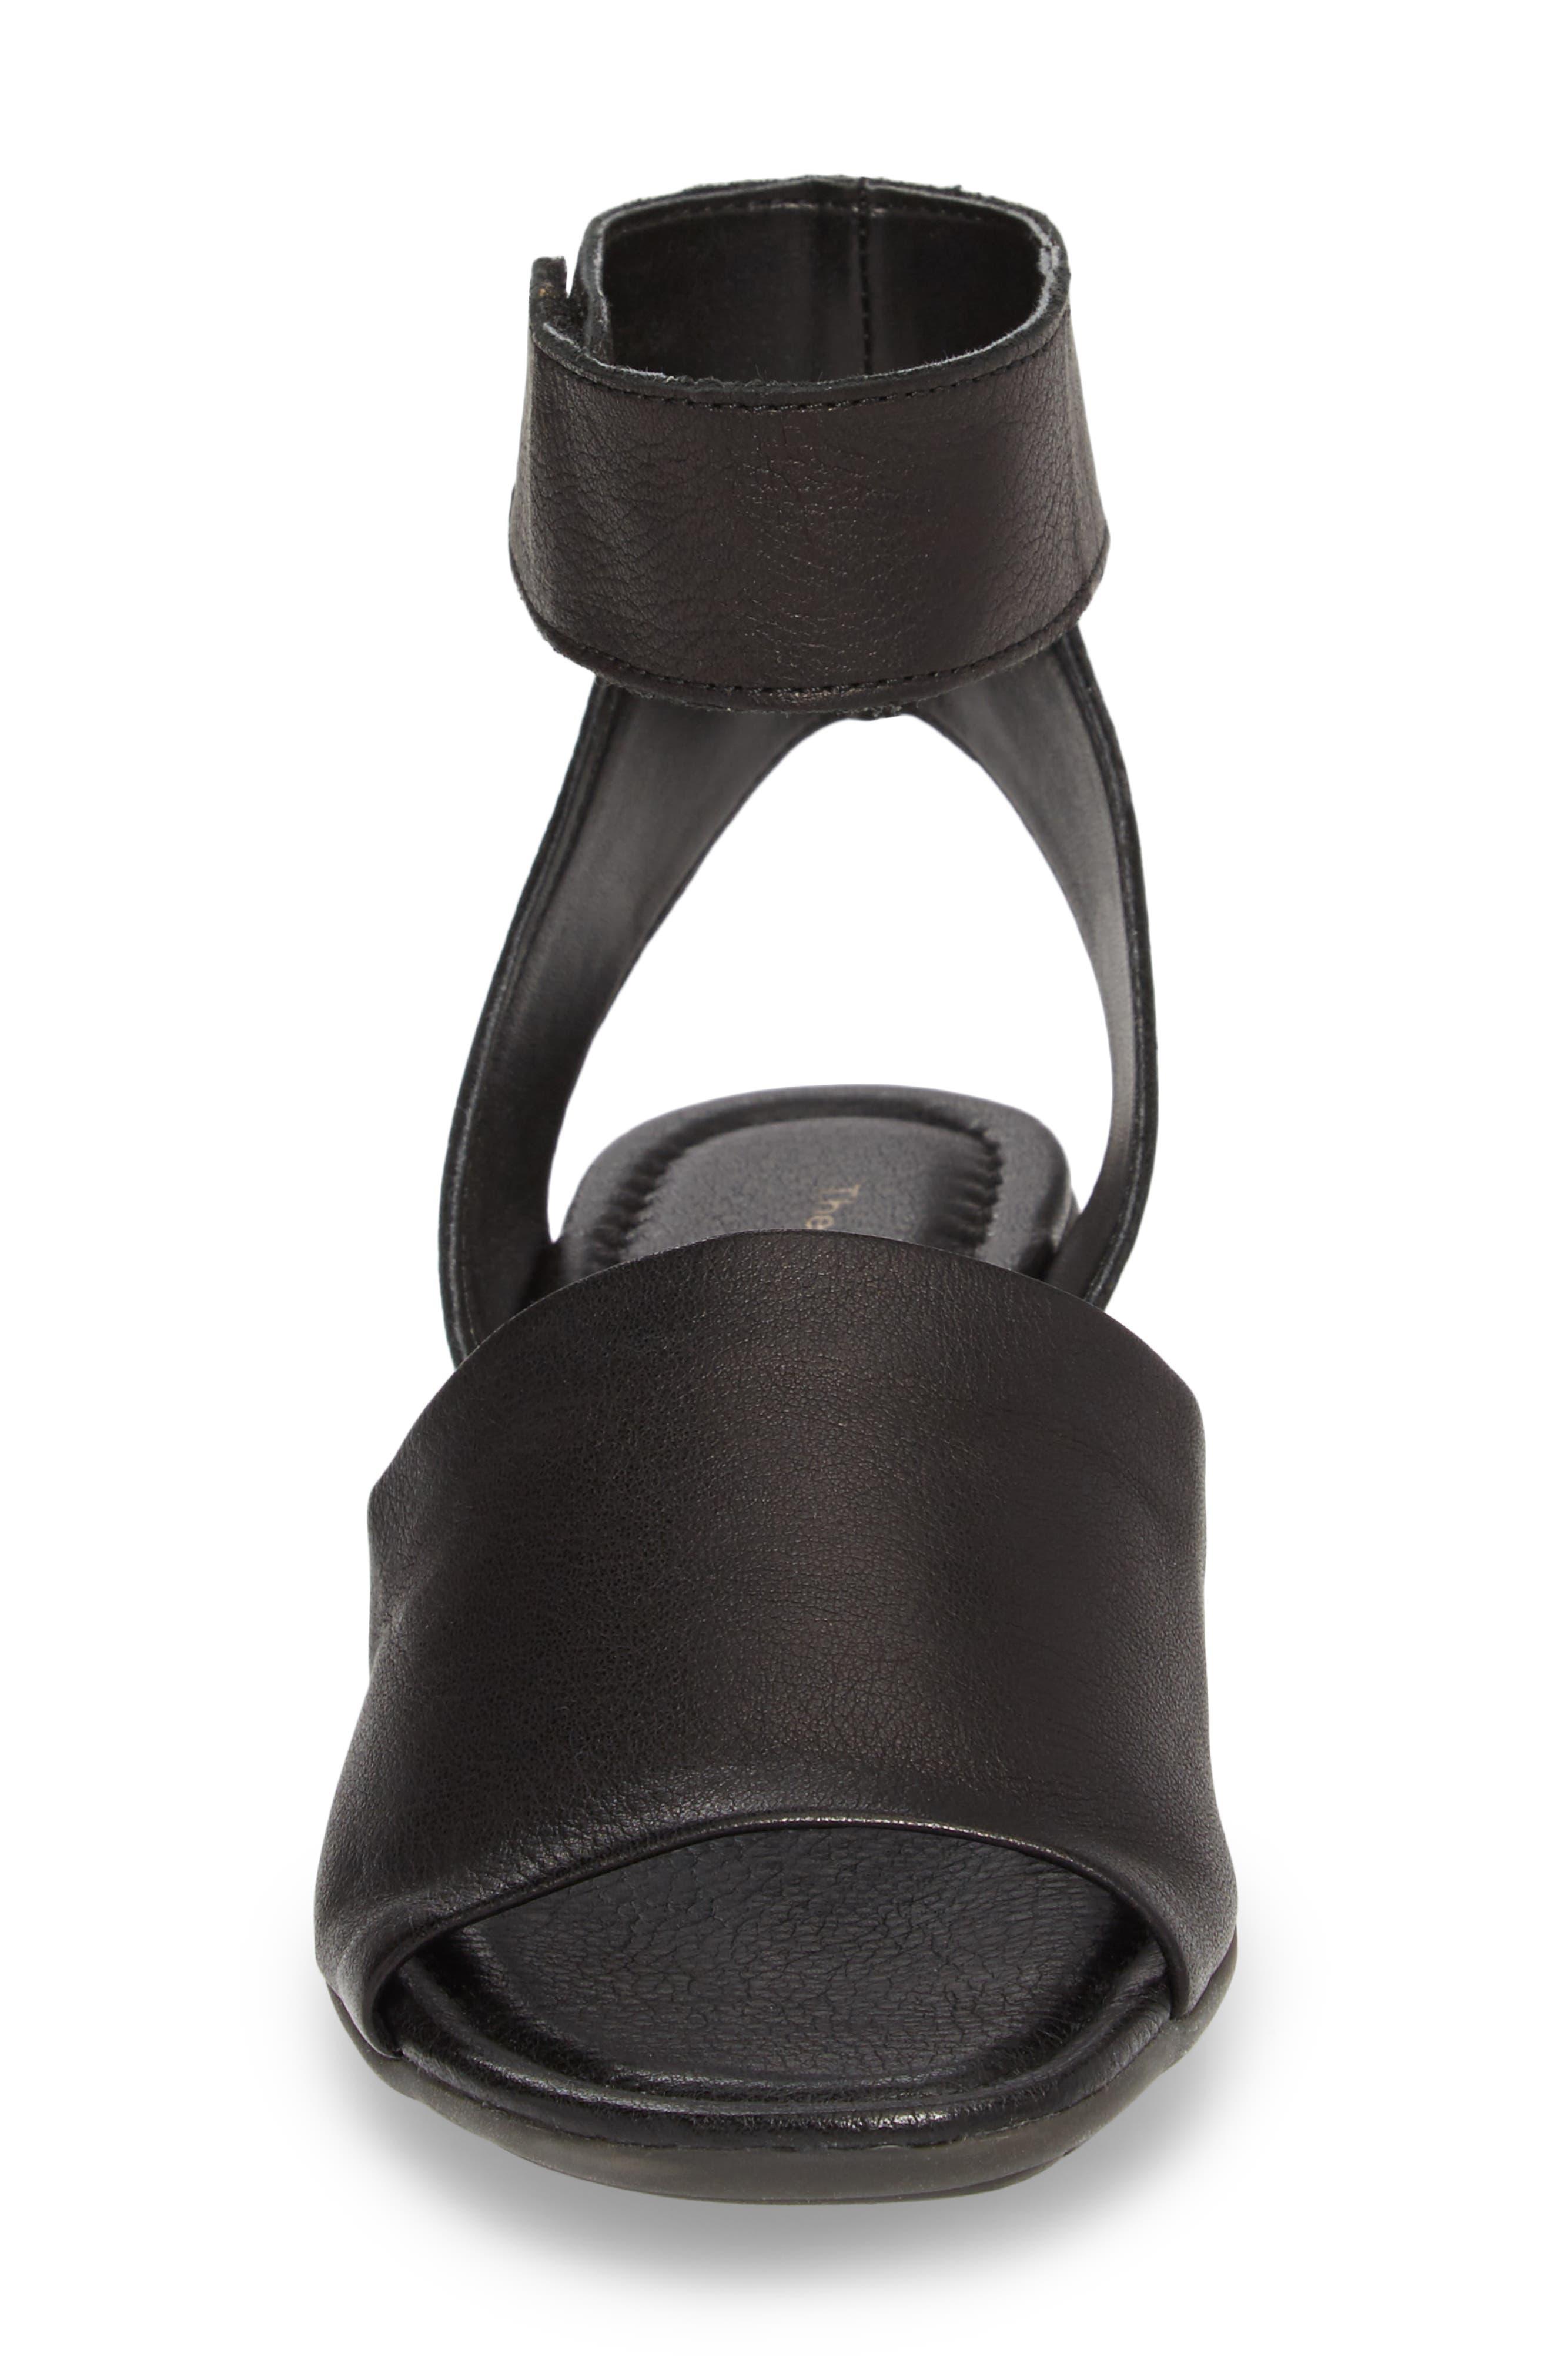 'Beglad' Leather Ankle Strap Sandal,                             Alternate thumbnail 4, color,                             Black Vachetta Leather